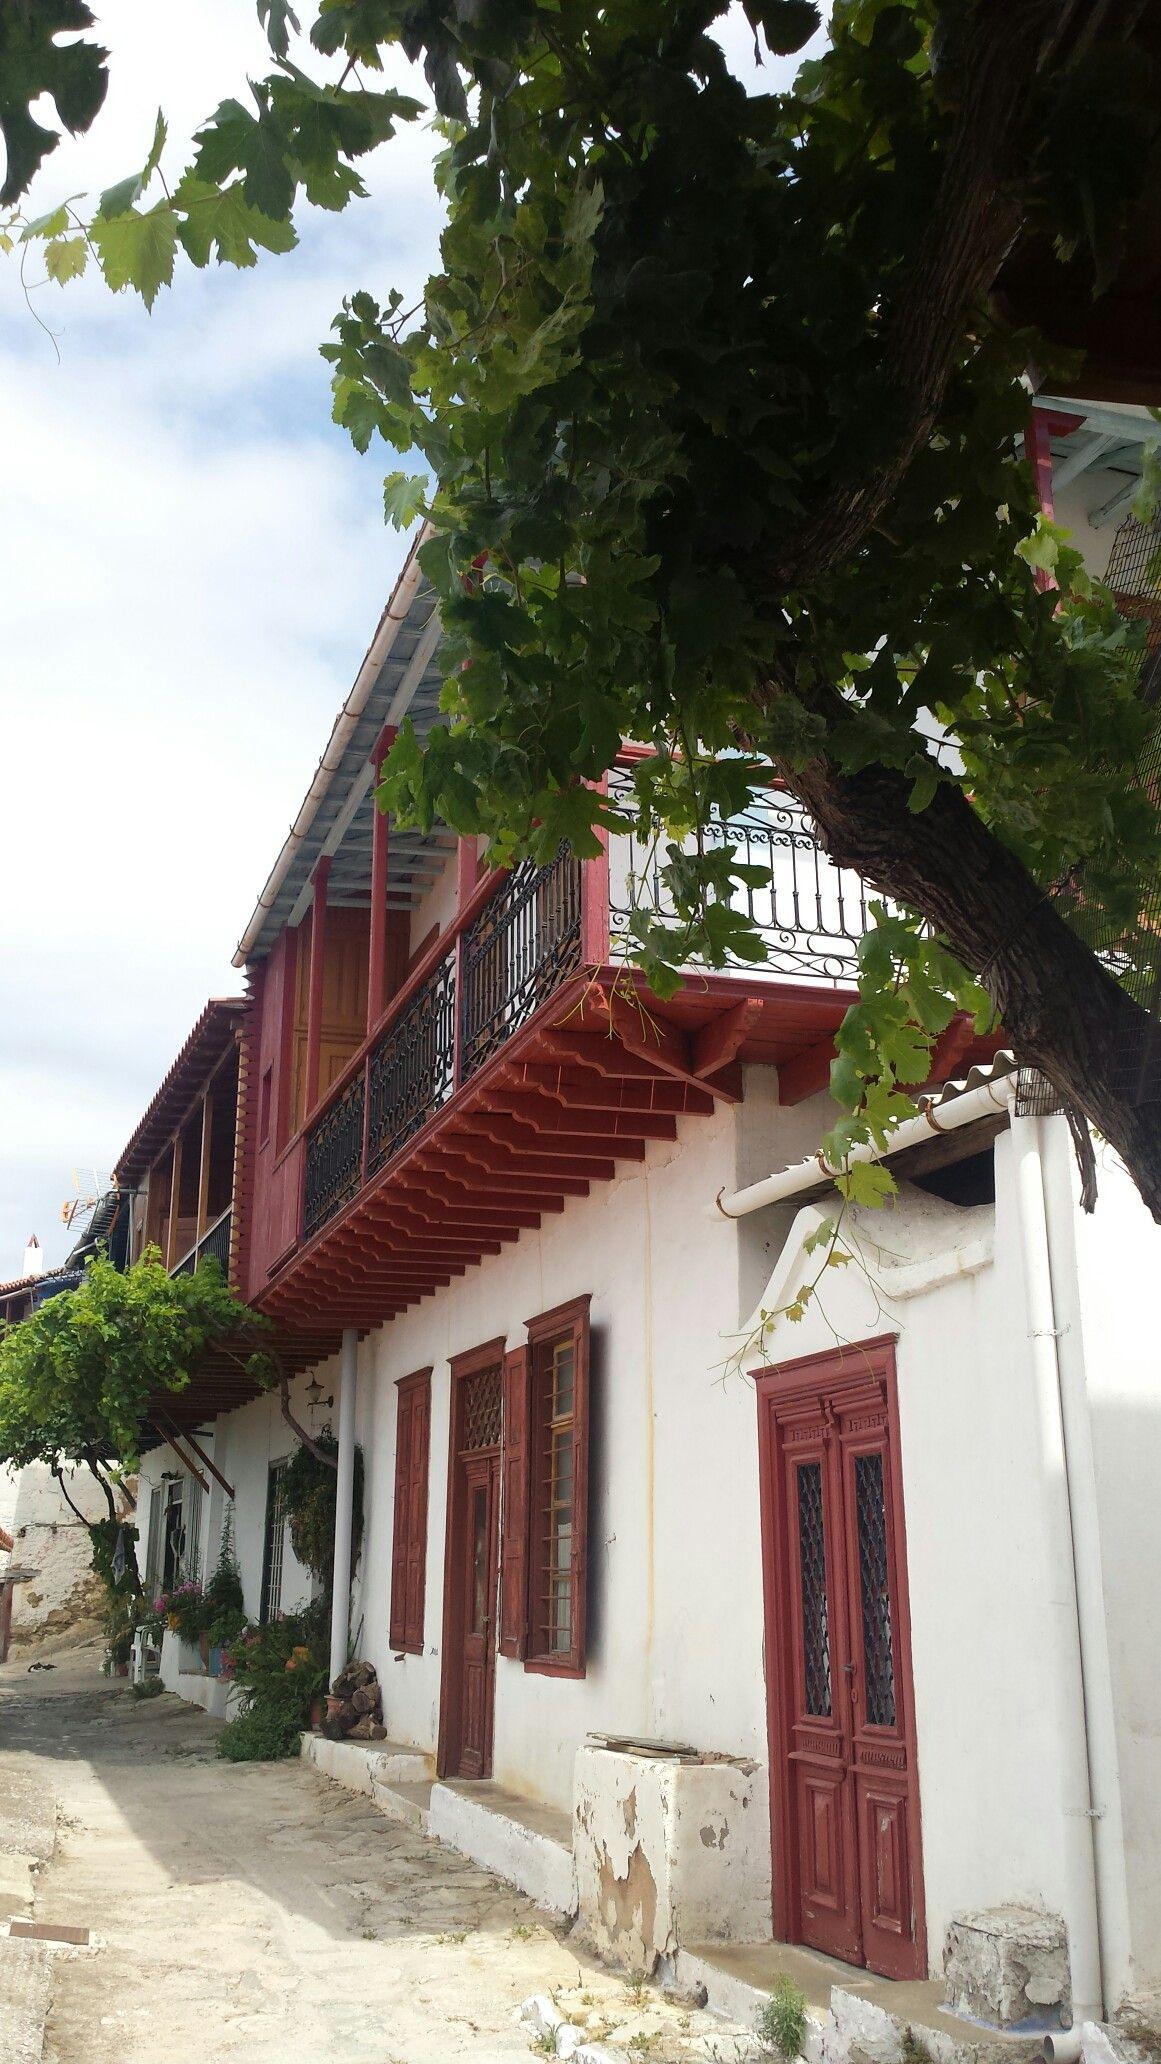 House in glossa - skopelos - greece